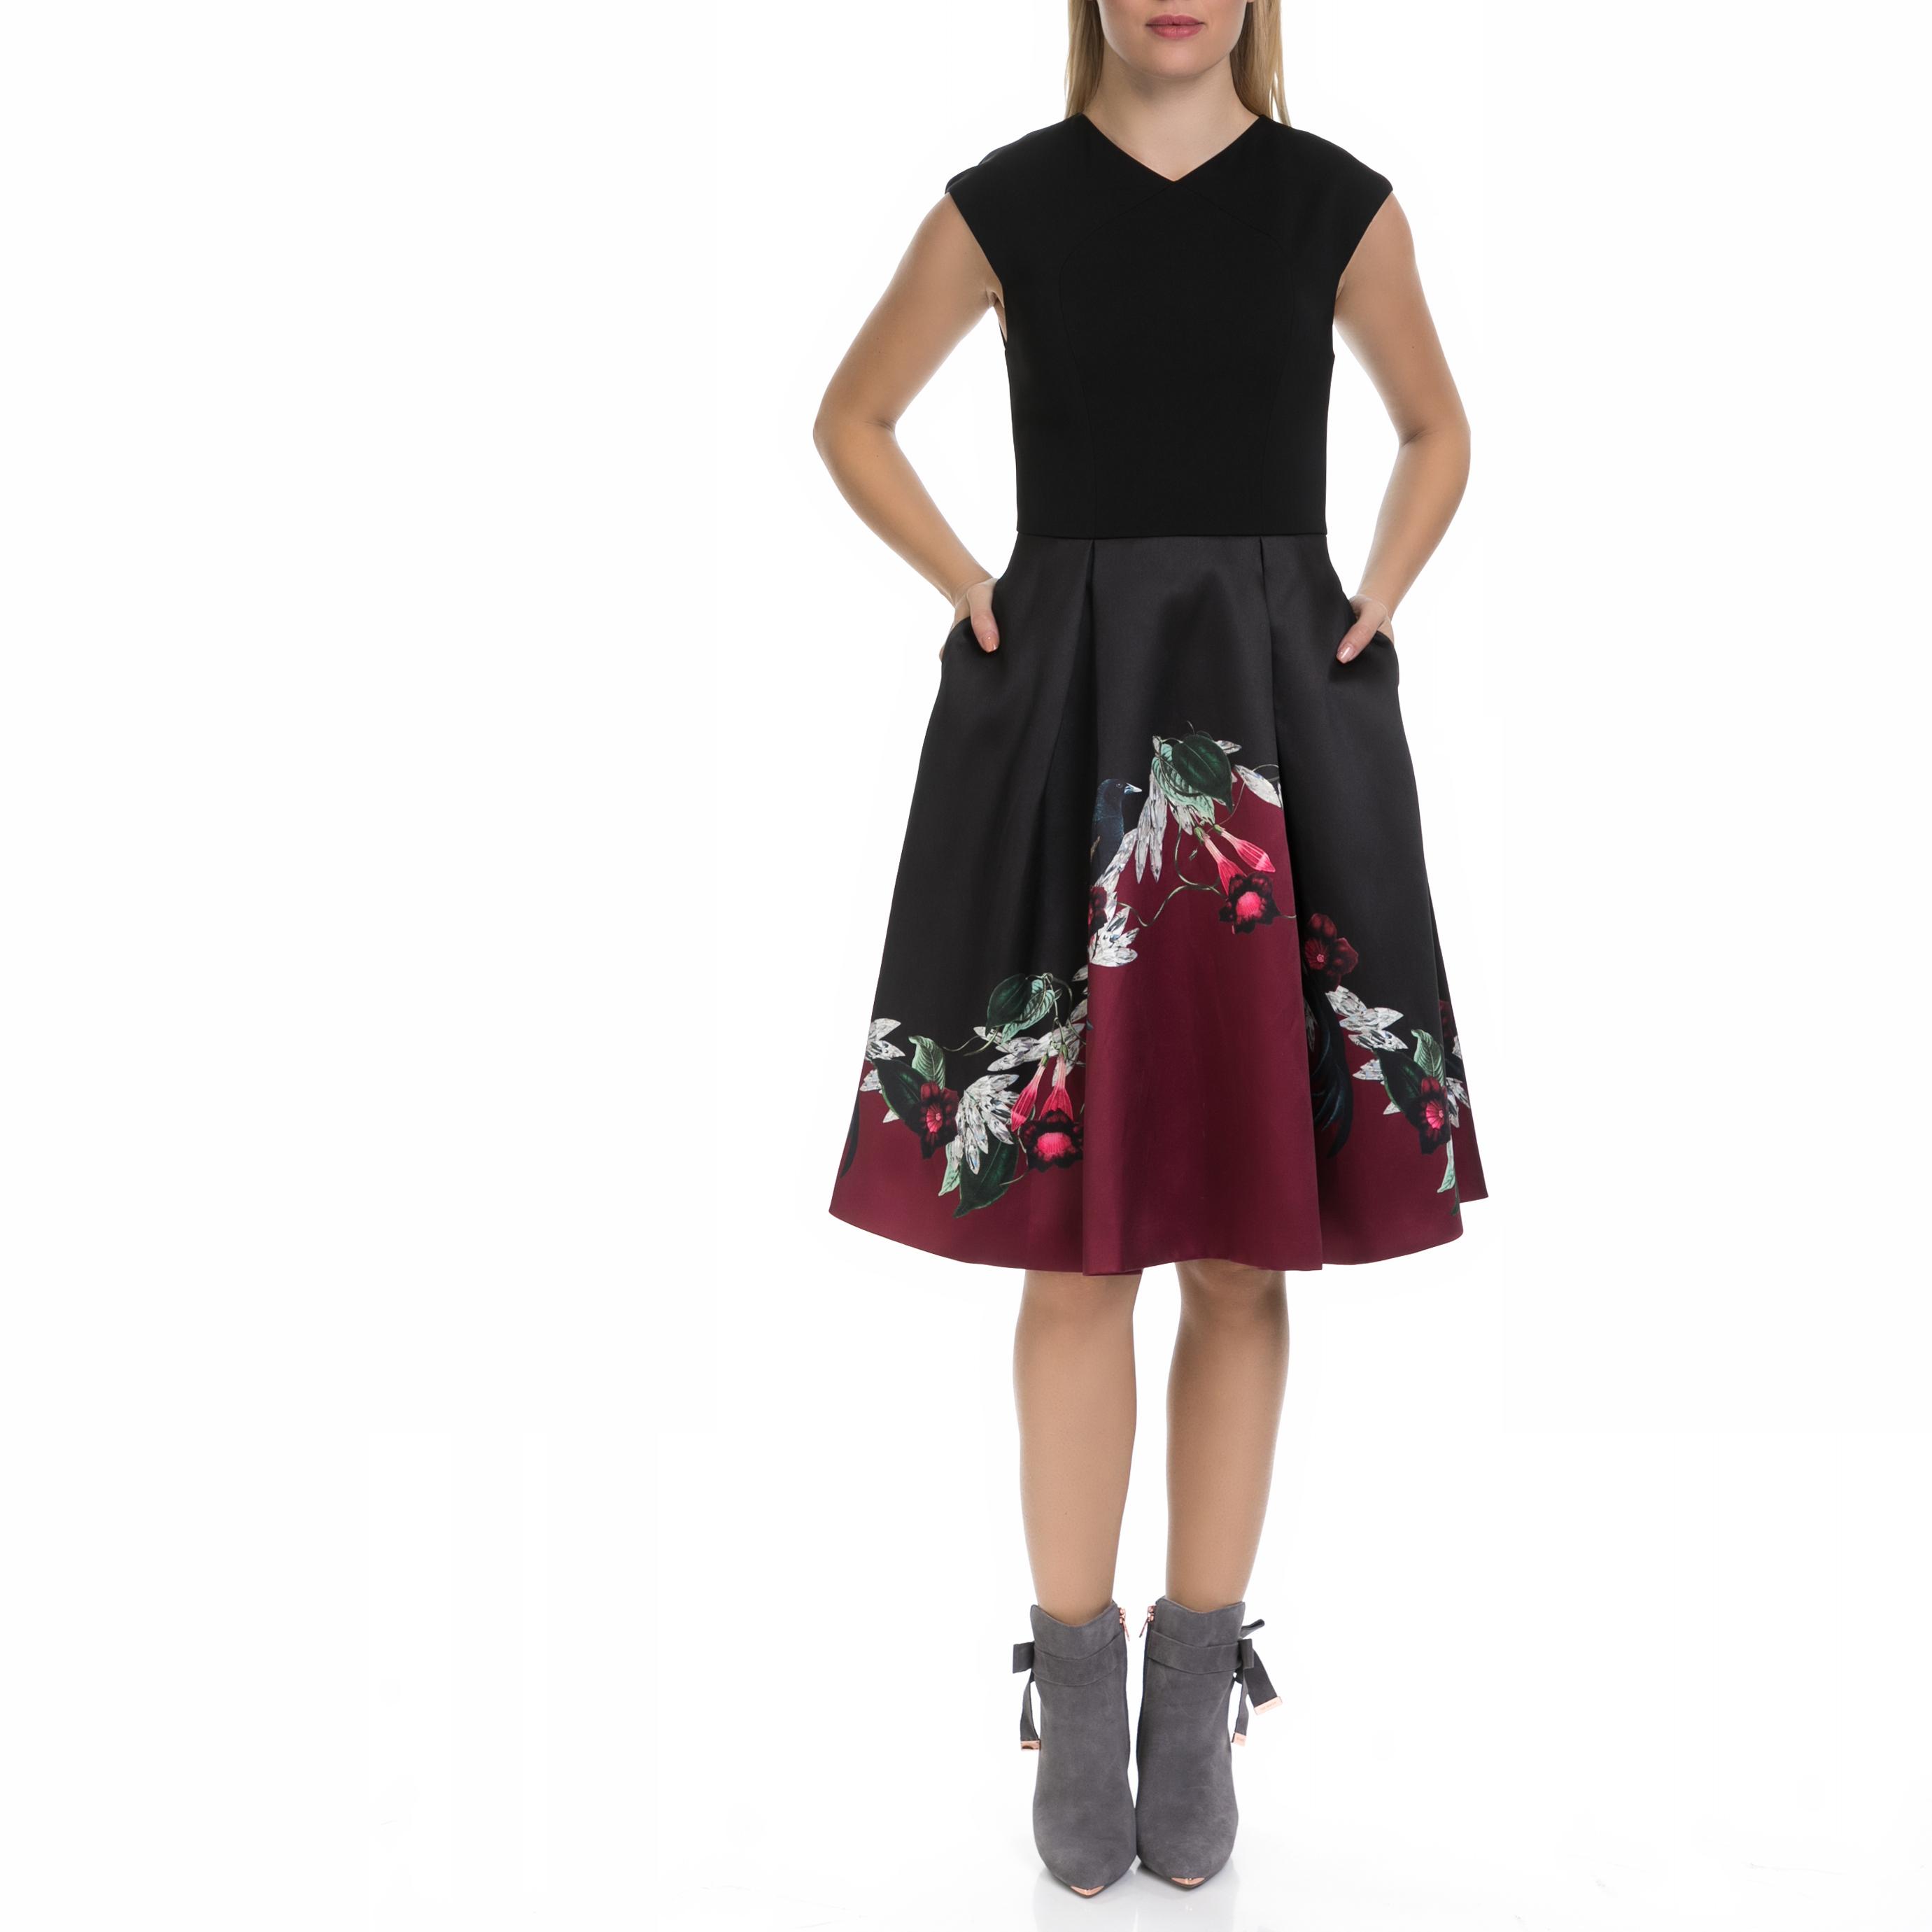 TED BAKER - Γυναικείο φόρεμα MHIA TED BAKER μαύρο-εμπριμέ γυναικεία ρούχα φορέματα μέχρι το γόνατο